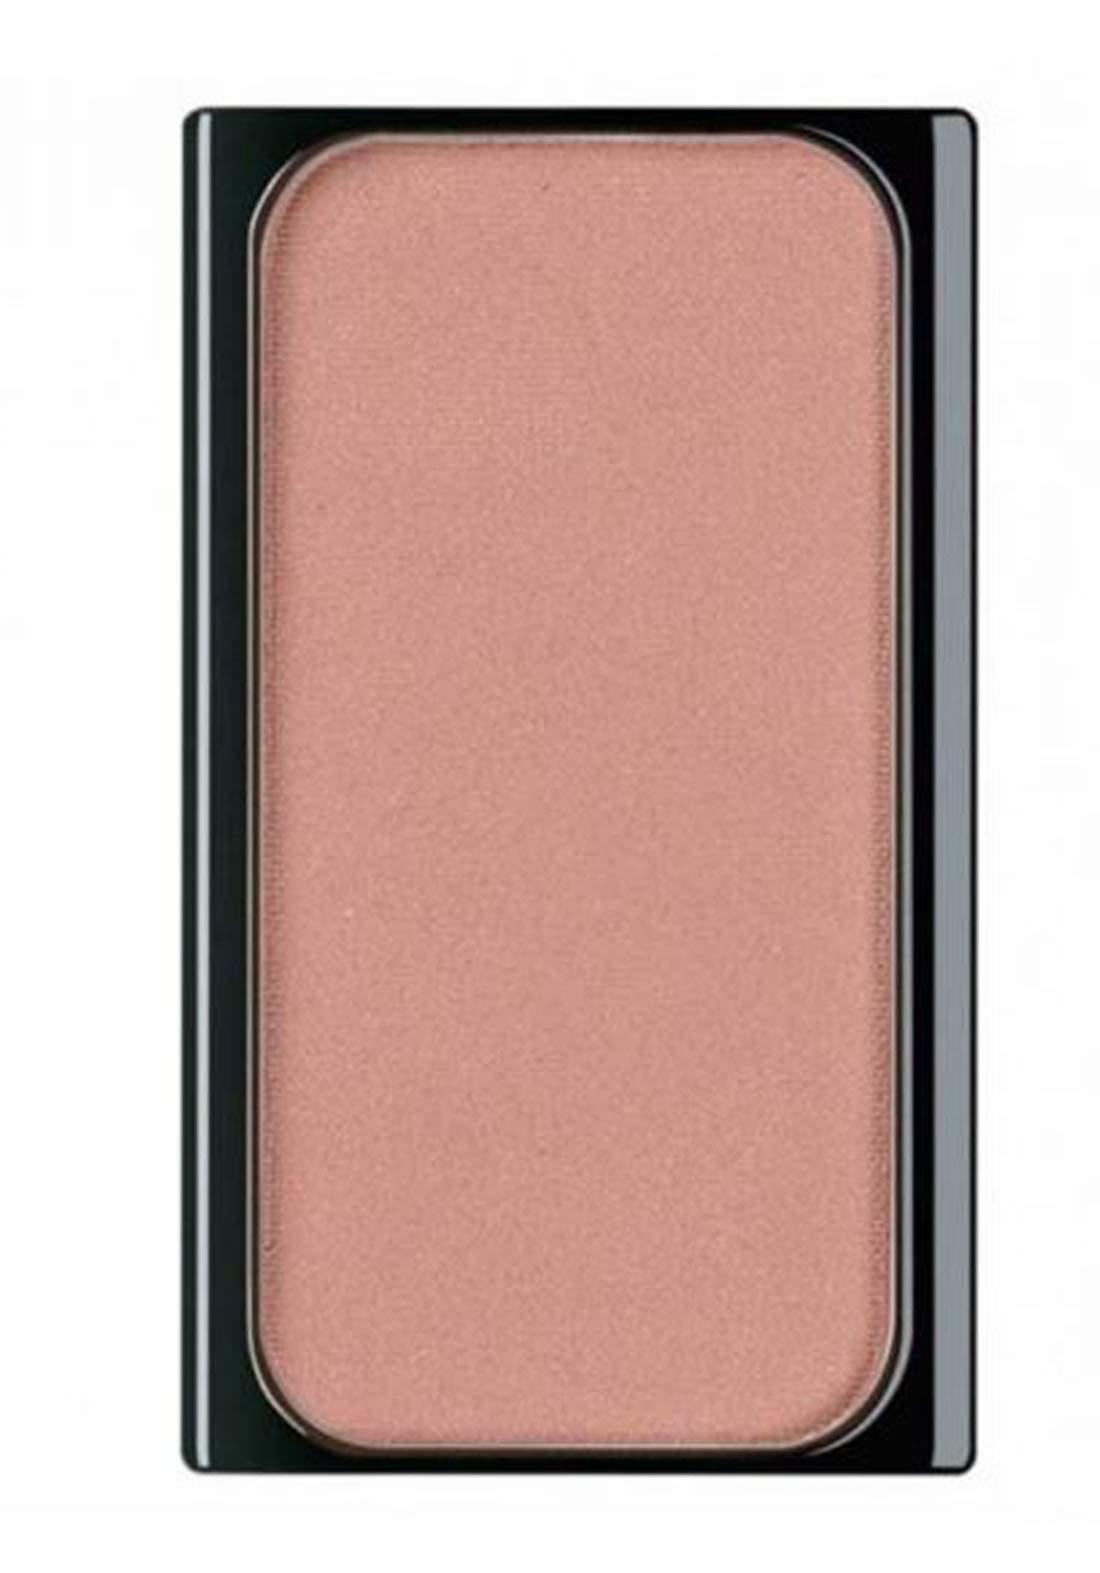 Artdeco Blusher No. 39 Orange Rosewood blush 5 g  احمر خدود